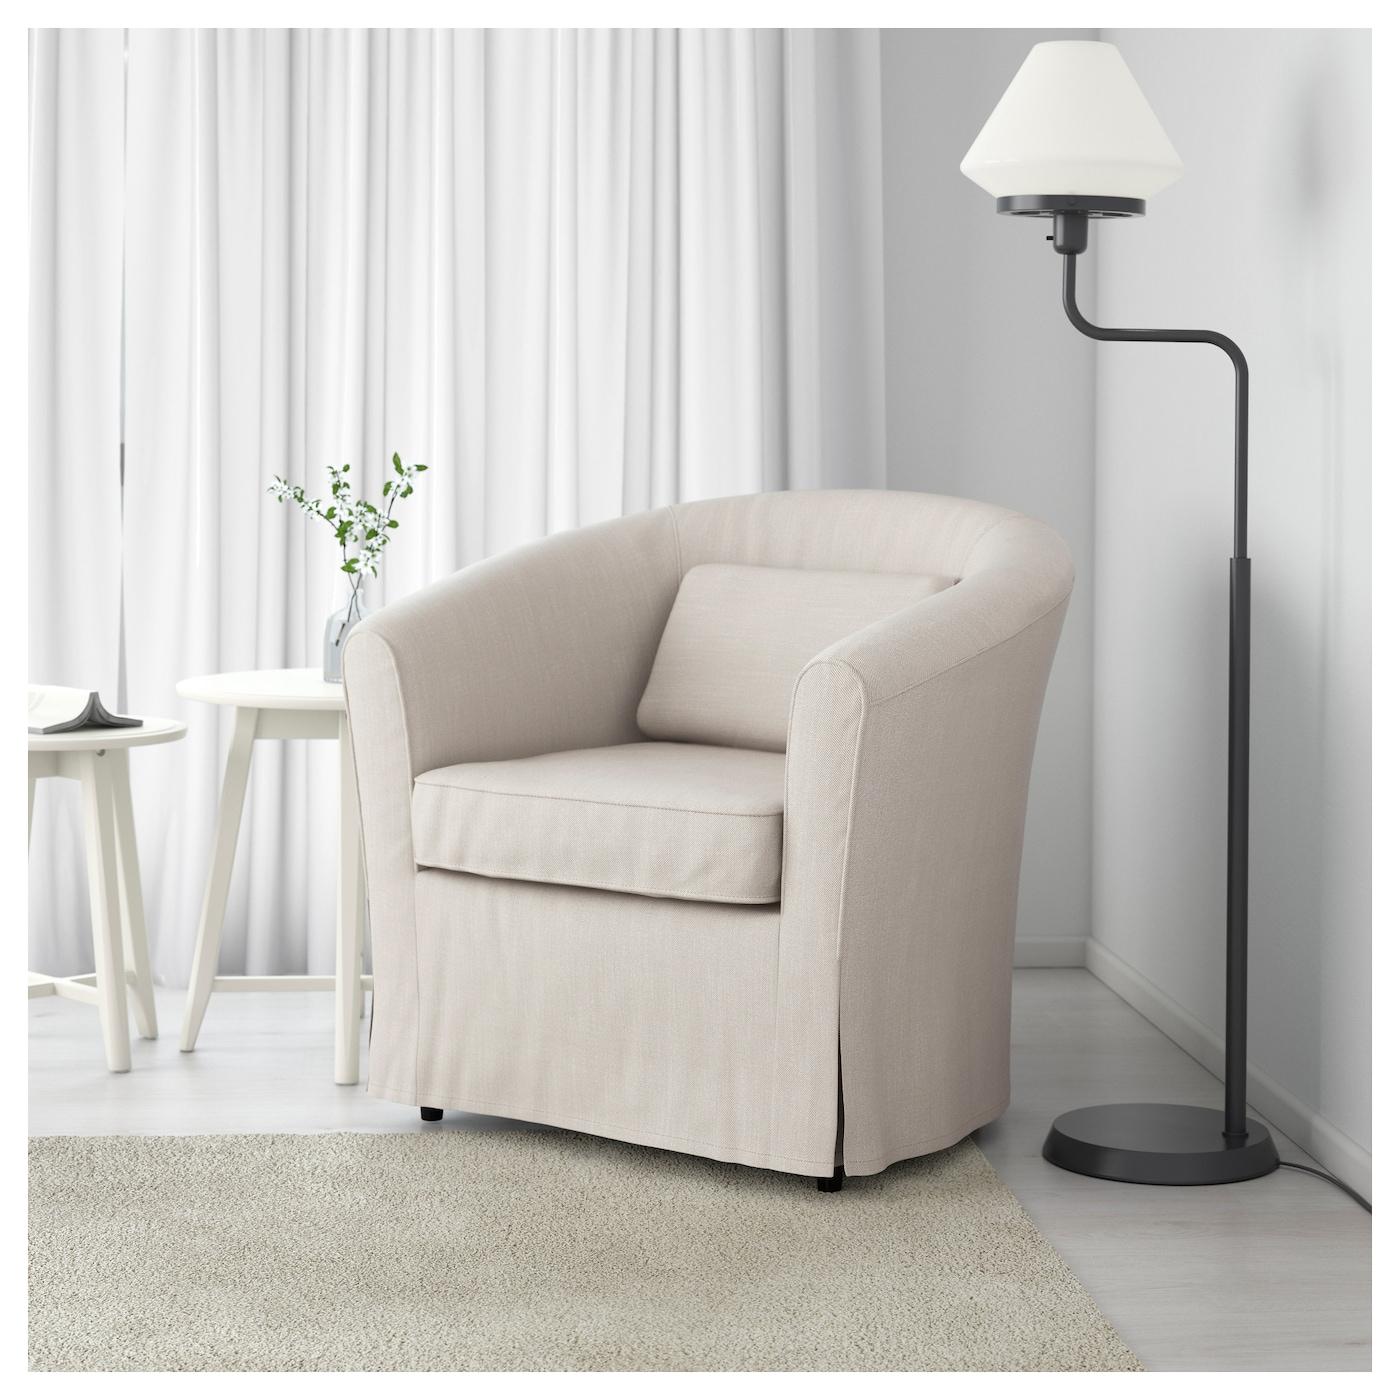 tullsta fauteuil nordvalla beige ikea. Black Bedroom Furniture Sets. Home Design Ideas